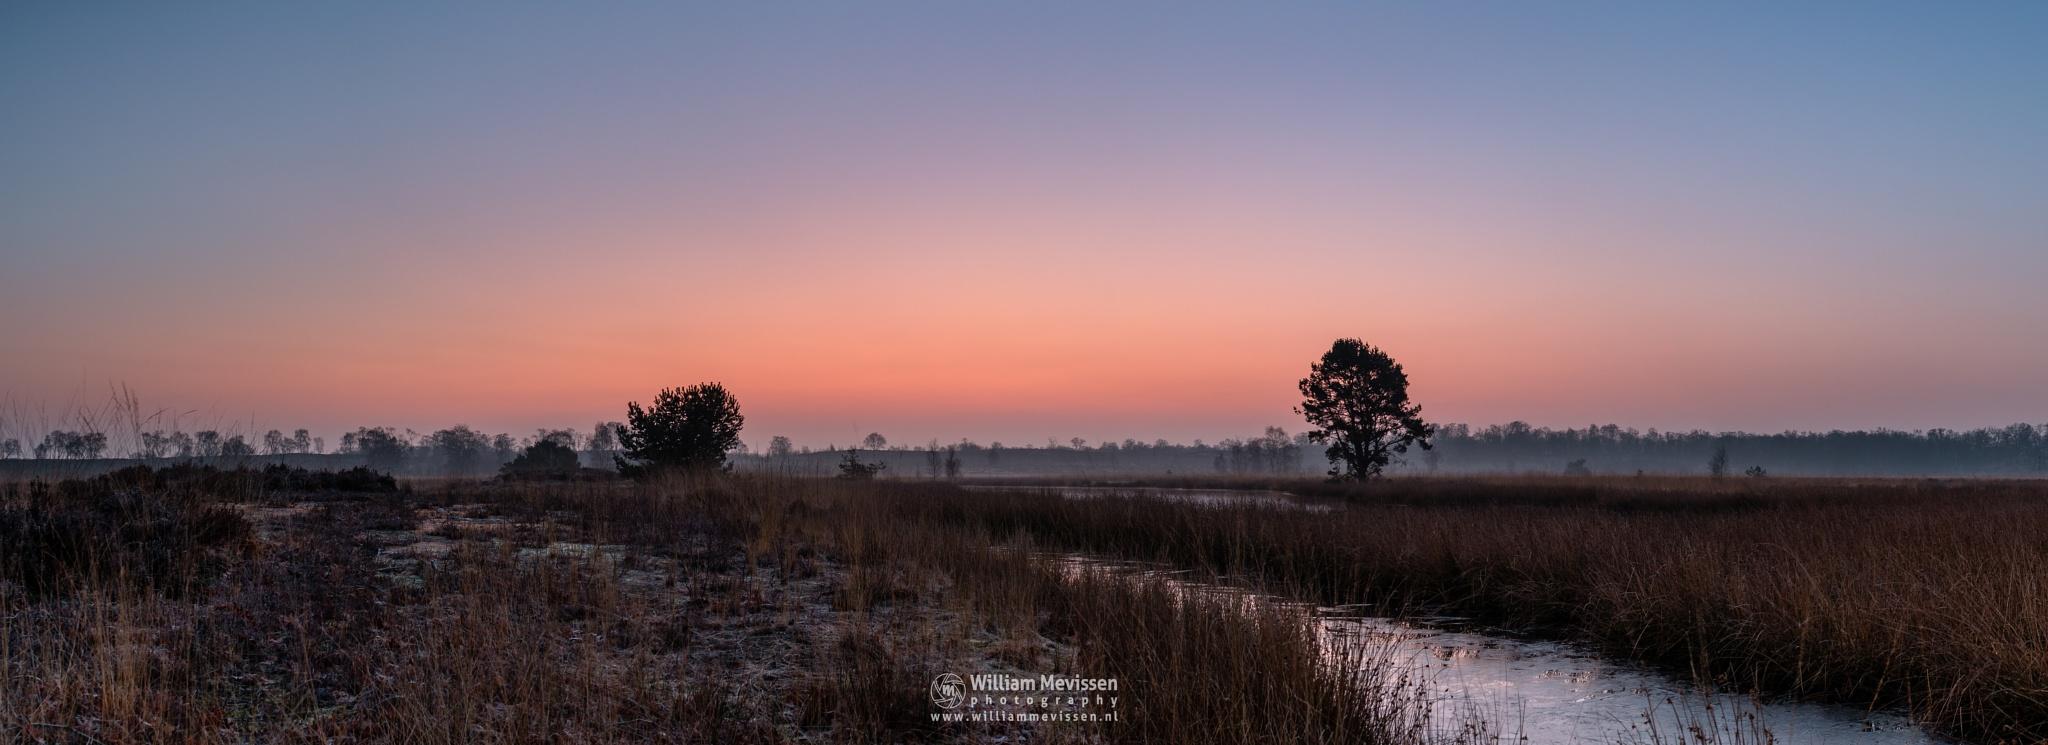 Panorama 'Misty Frosty Twilight'  by William Mevissen